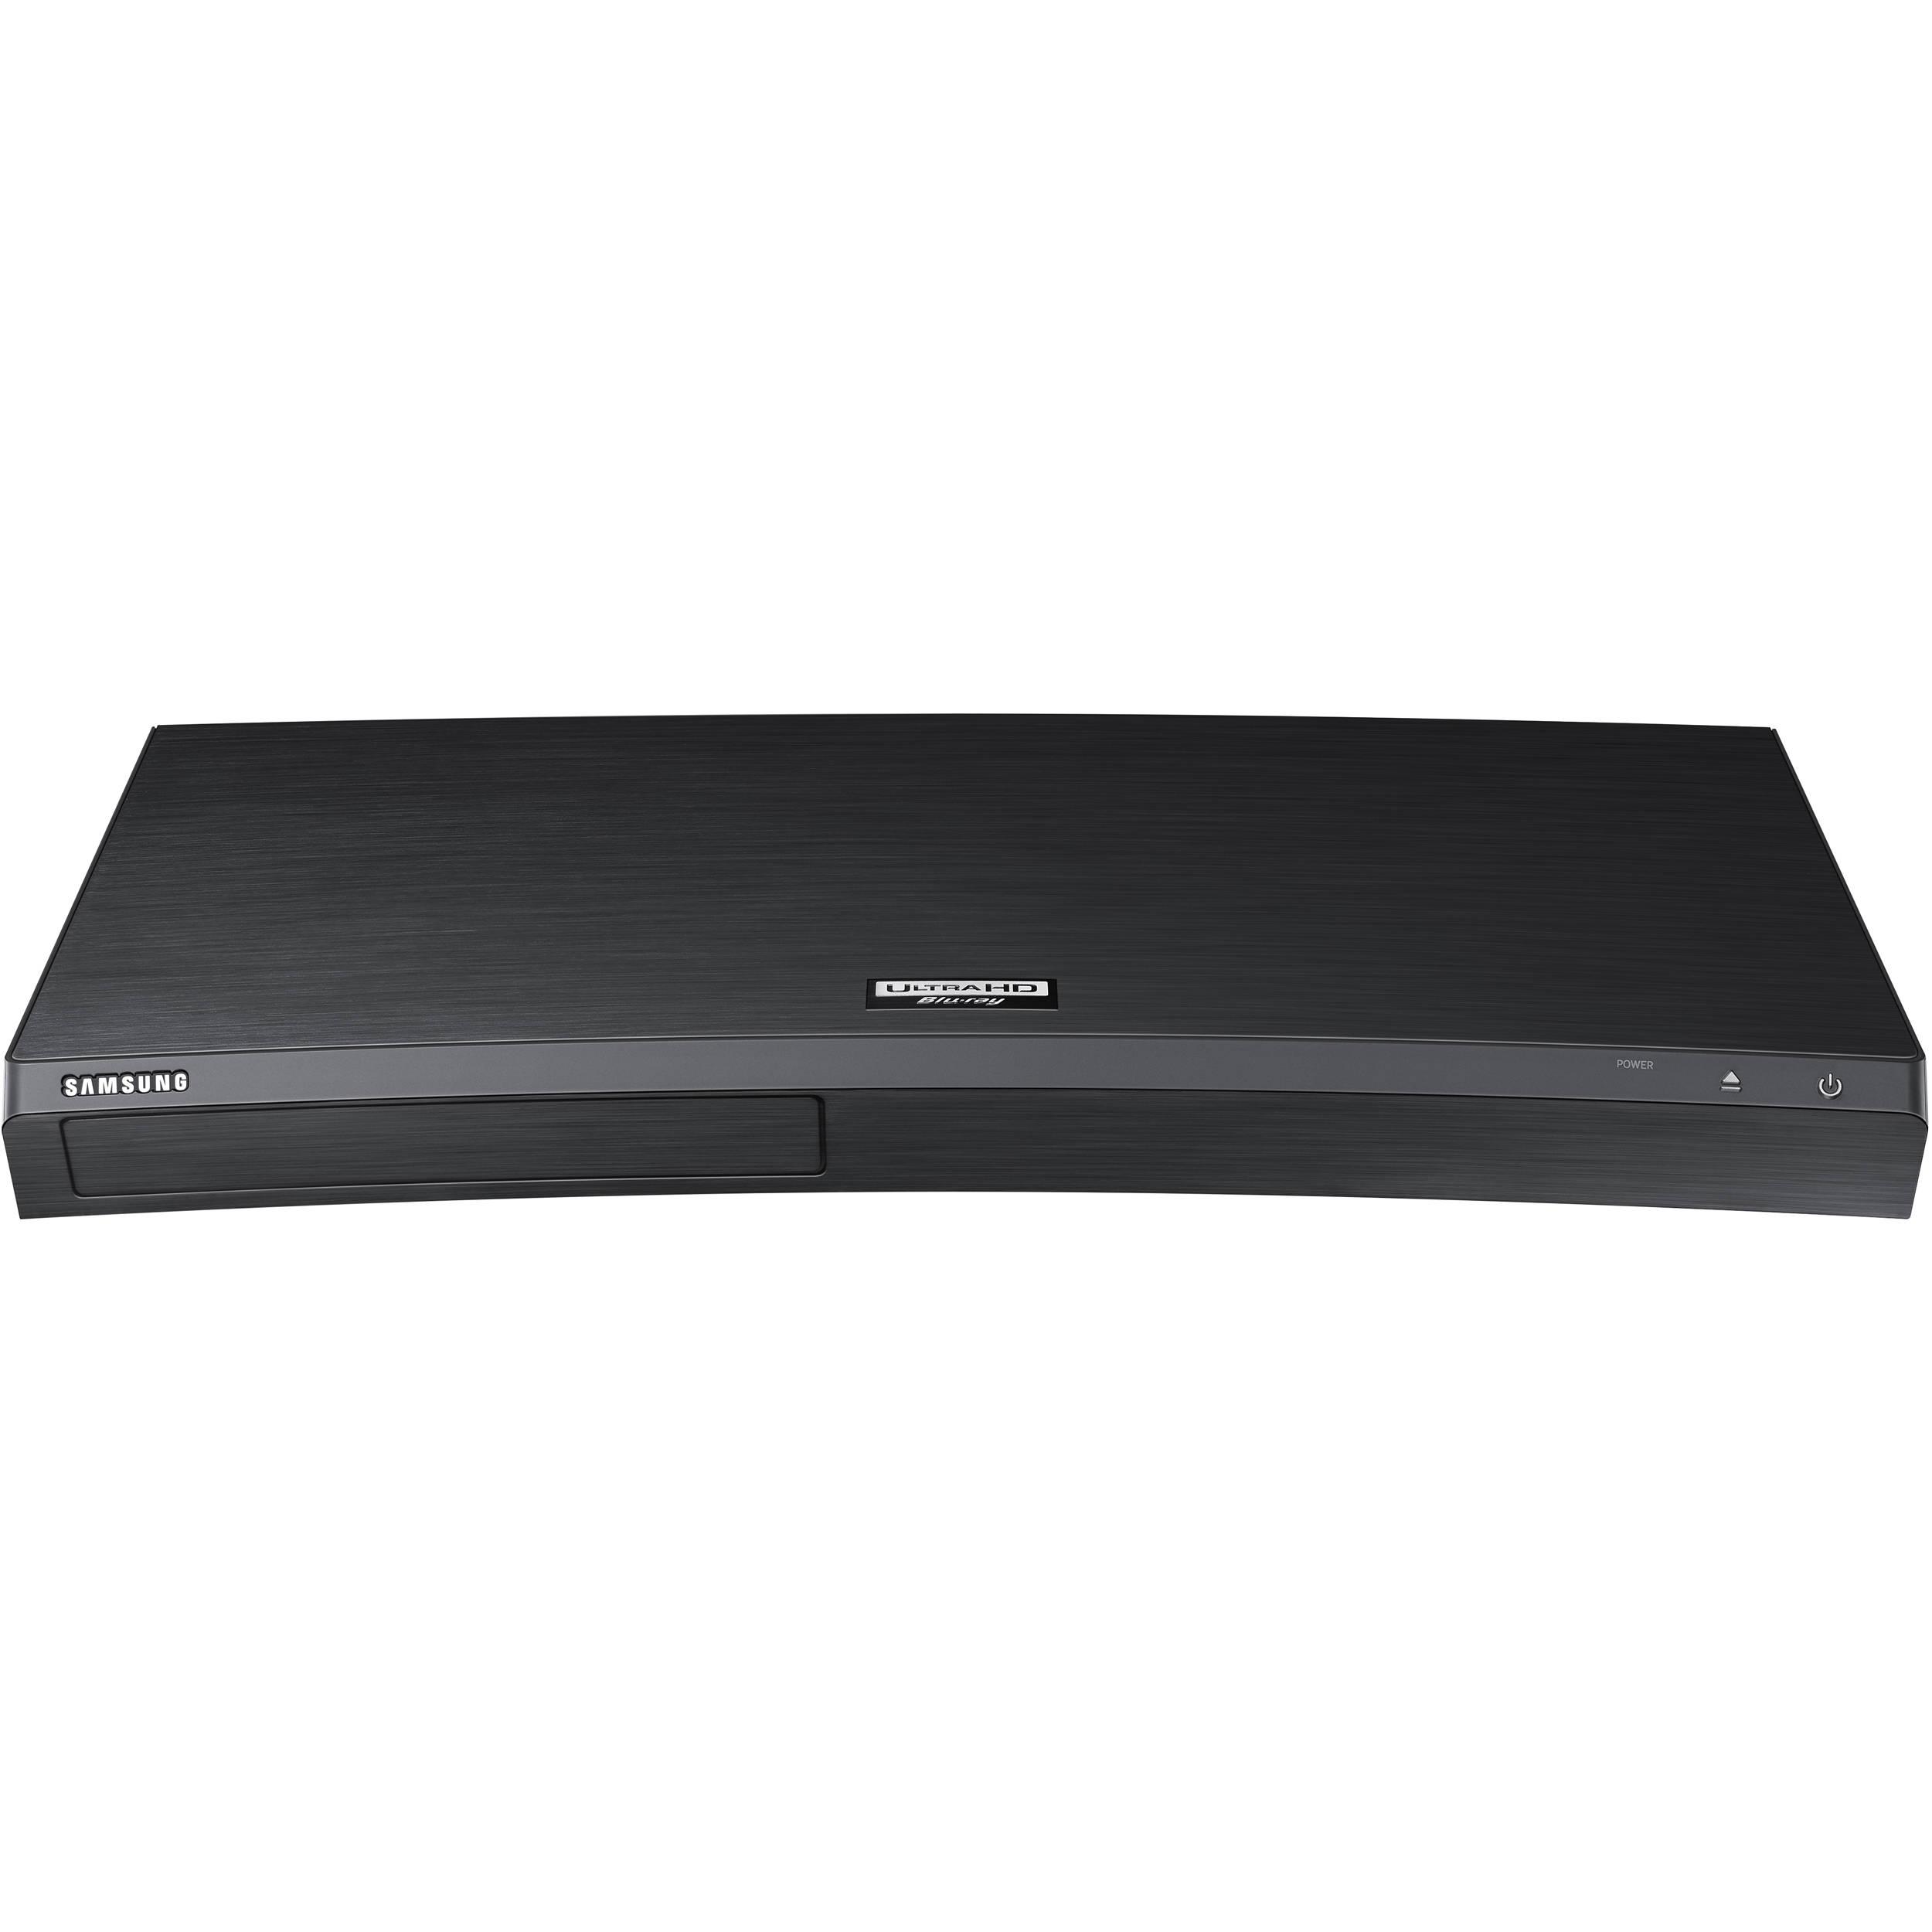 Samsung UBD-M9500 HDR UHD Upscaling Blu-ray Disc Player